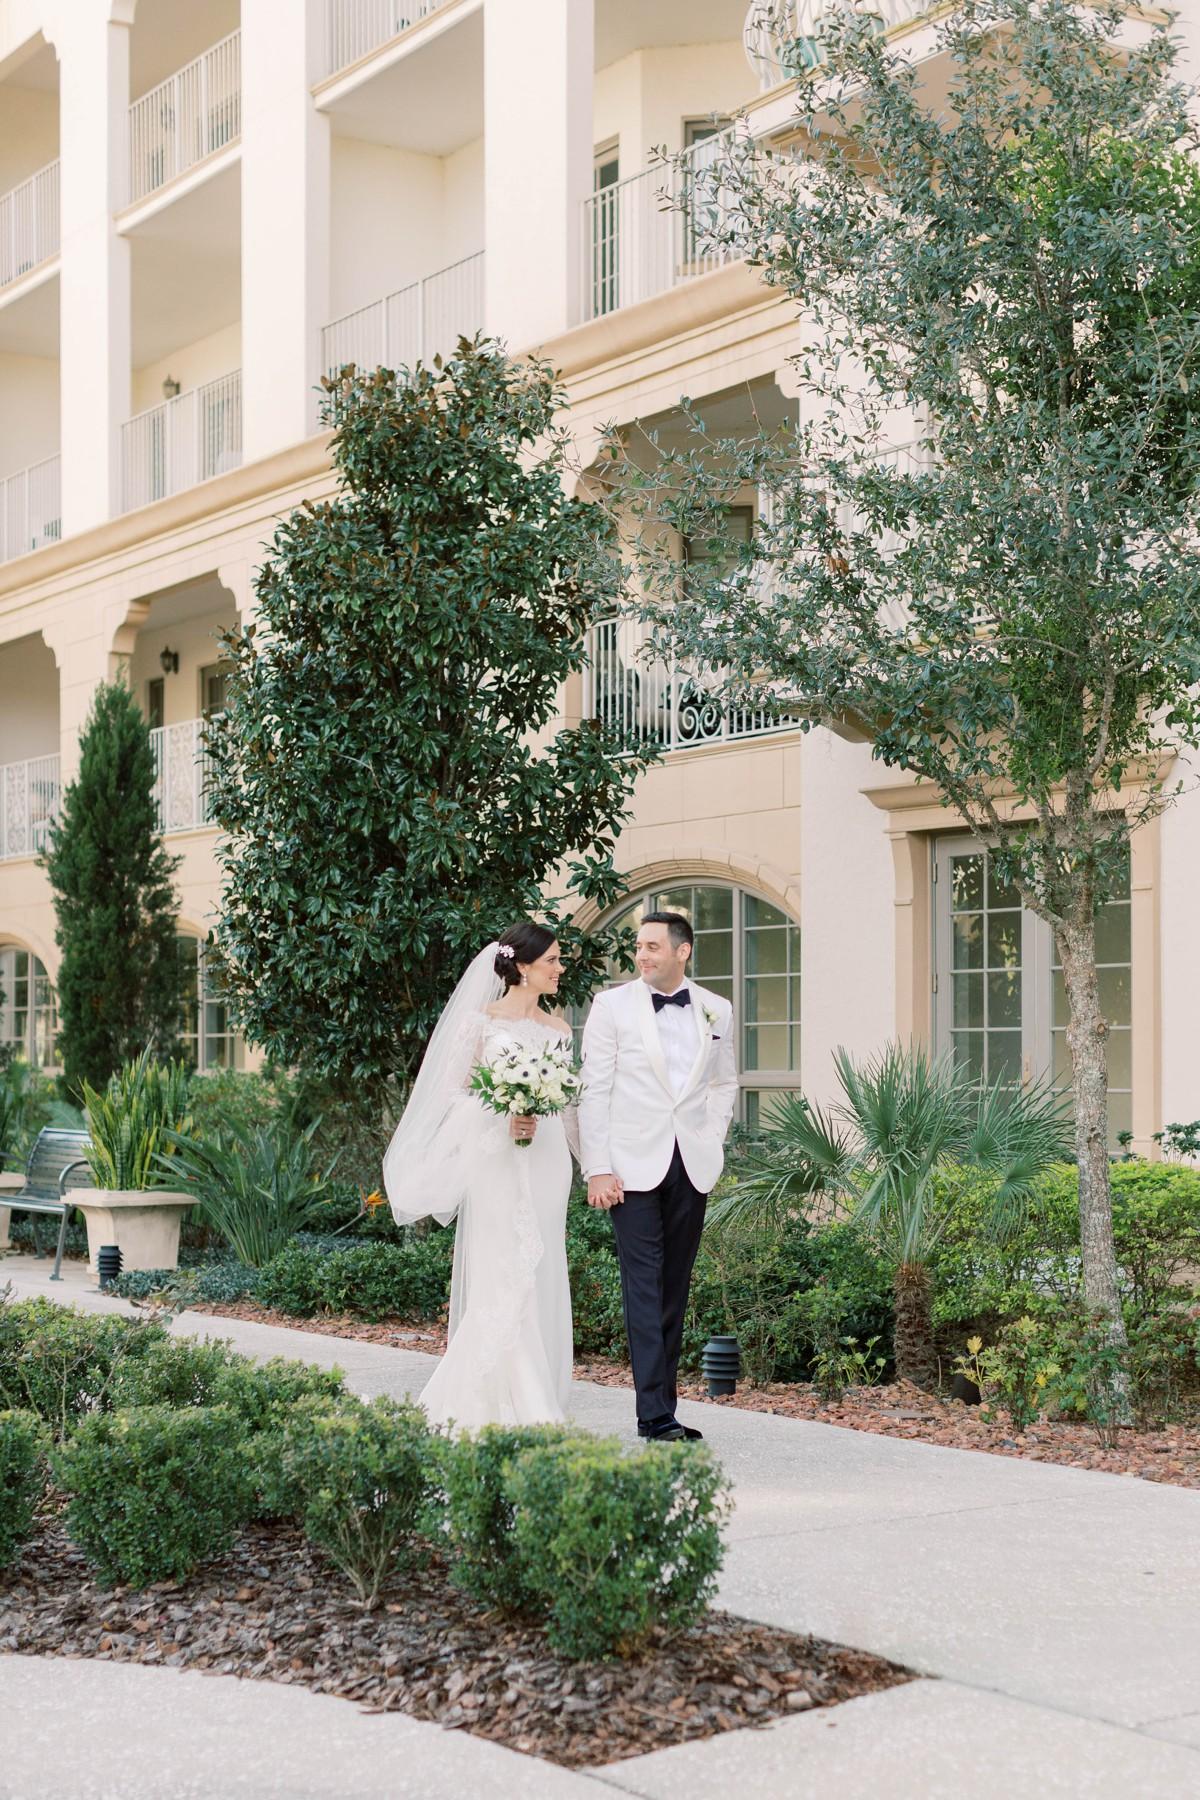 Alfond-Inn-Wedding-Winter-Park-Wedding-Photographer-Chantell-Rae-Photography_0022.jpg